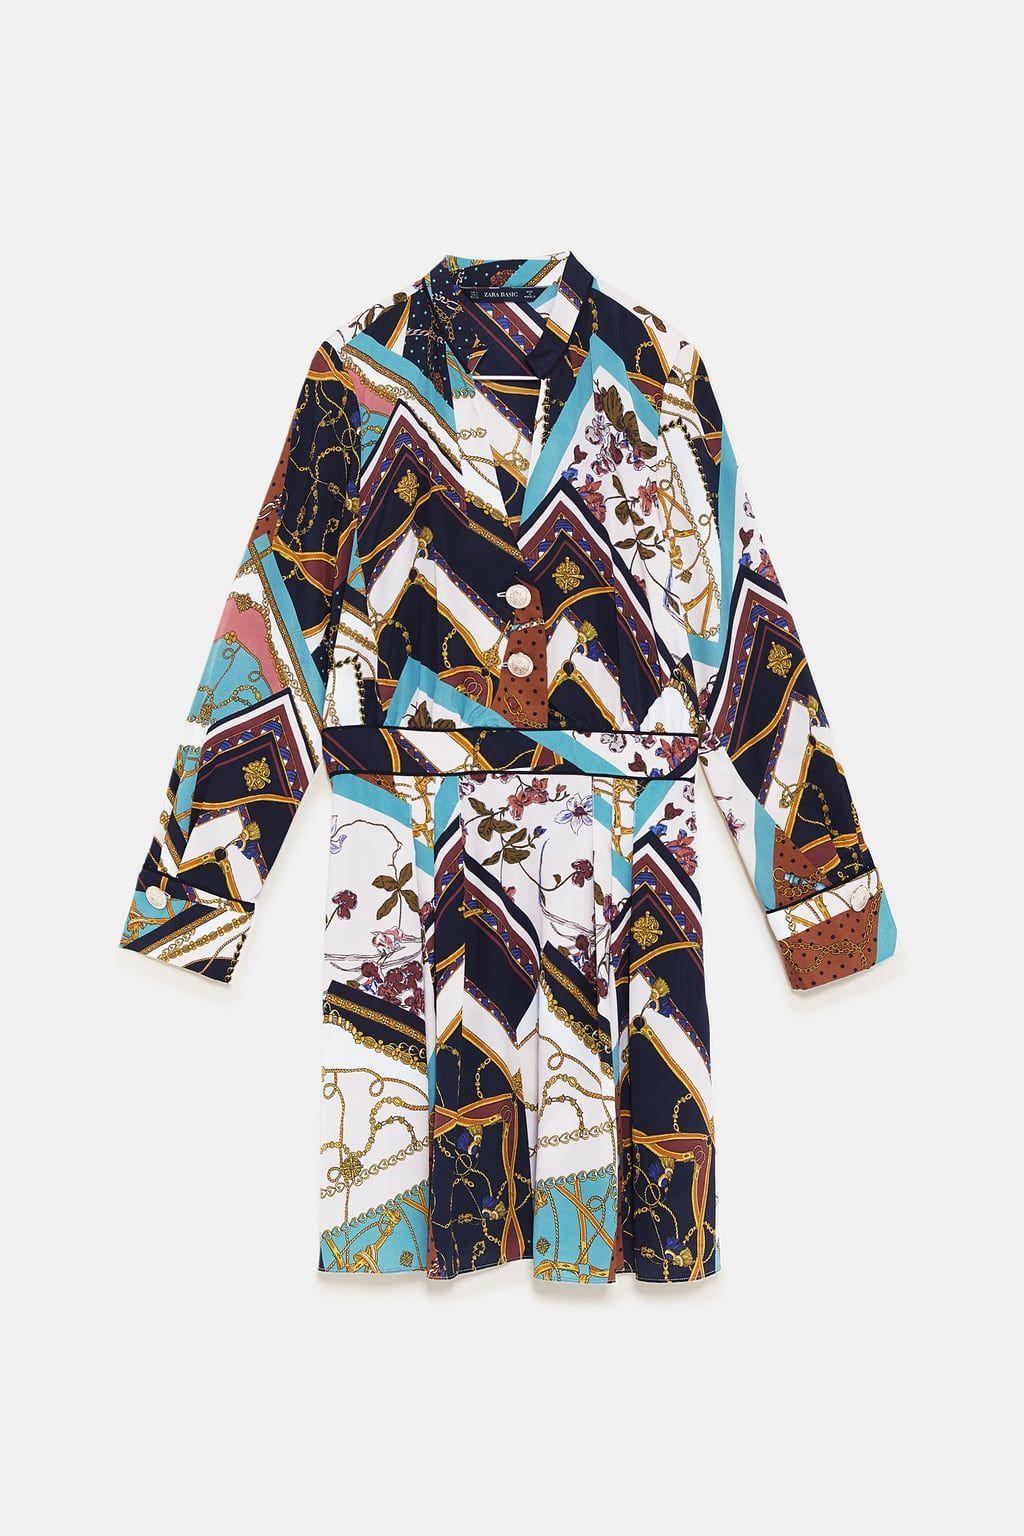 c16755f0 Image 8 of CHAIN PATCHWORK PRINT DRESS from Zara | Wardrobe - Nov 18 ...